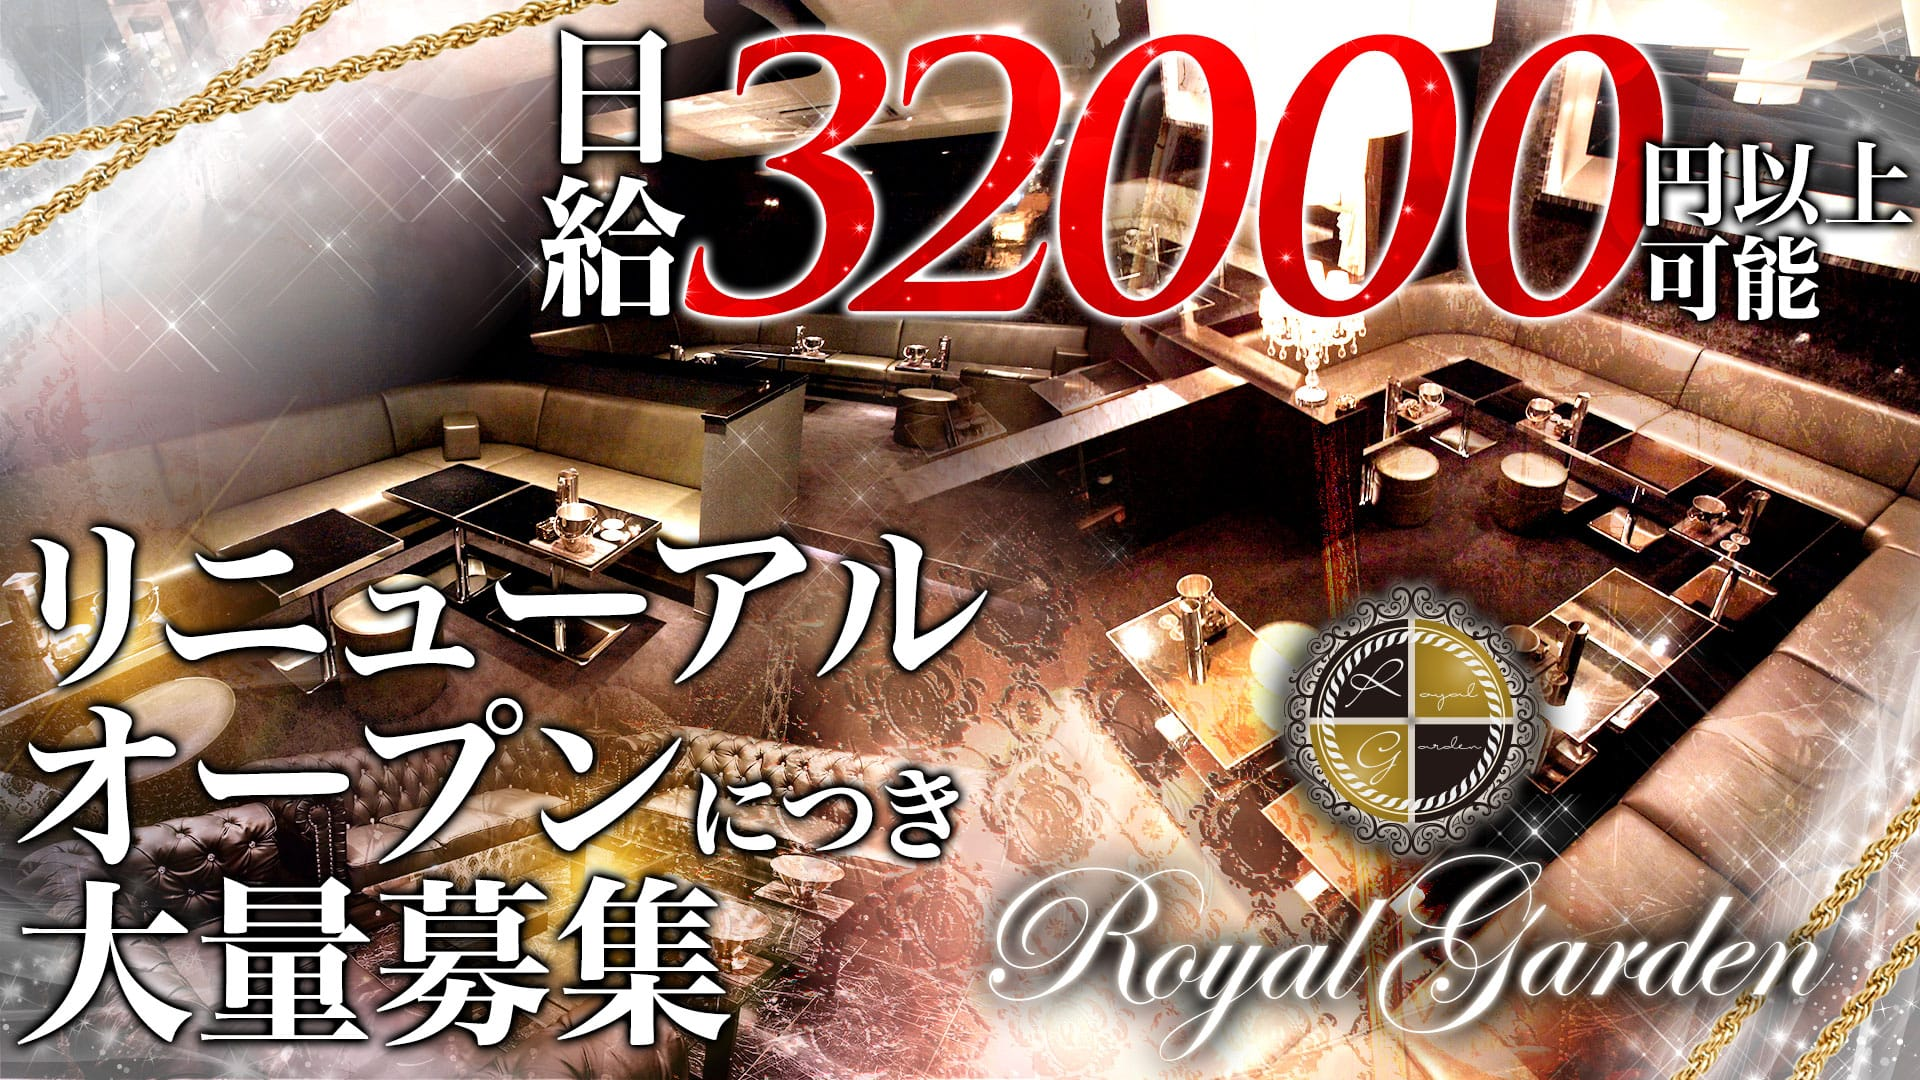 ROYAL GARDEN[ロイヤルガーデン] 関内 キャバクラ TOP画像